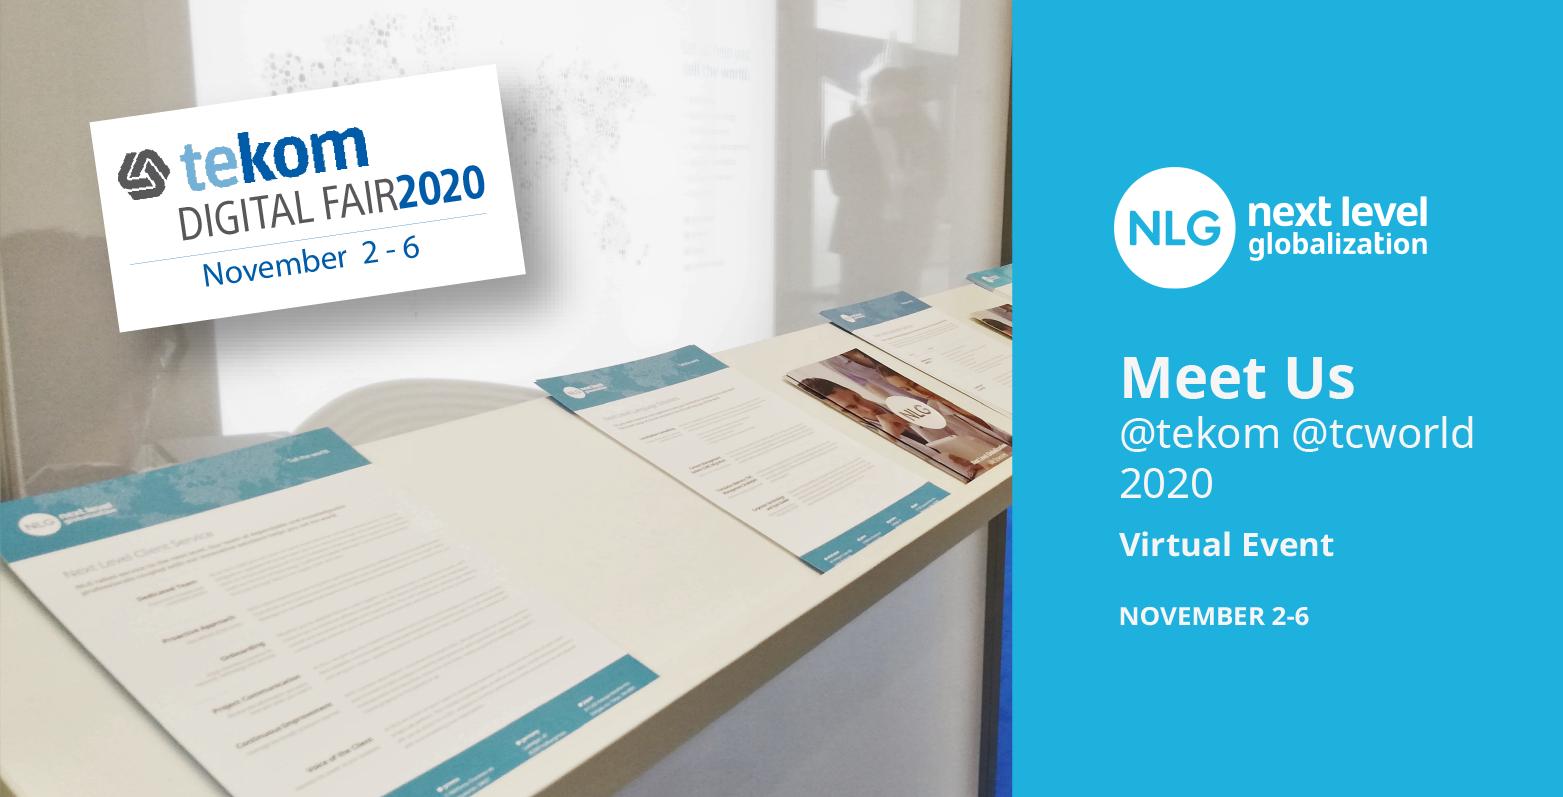 NlG tekom 2020